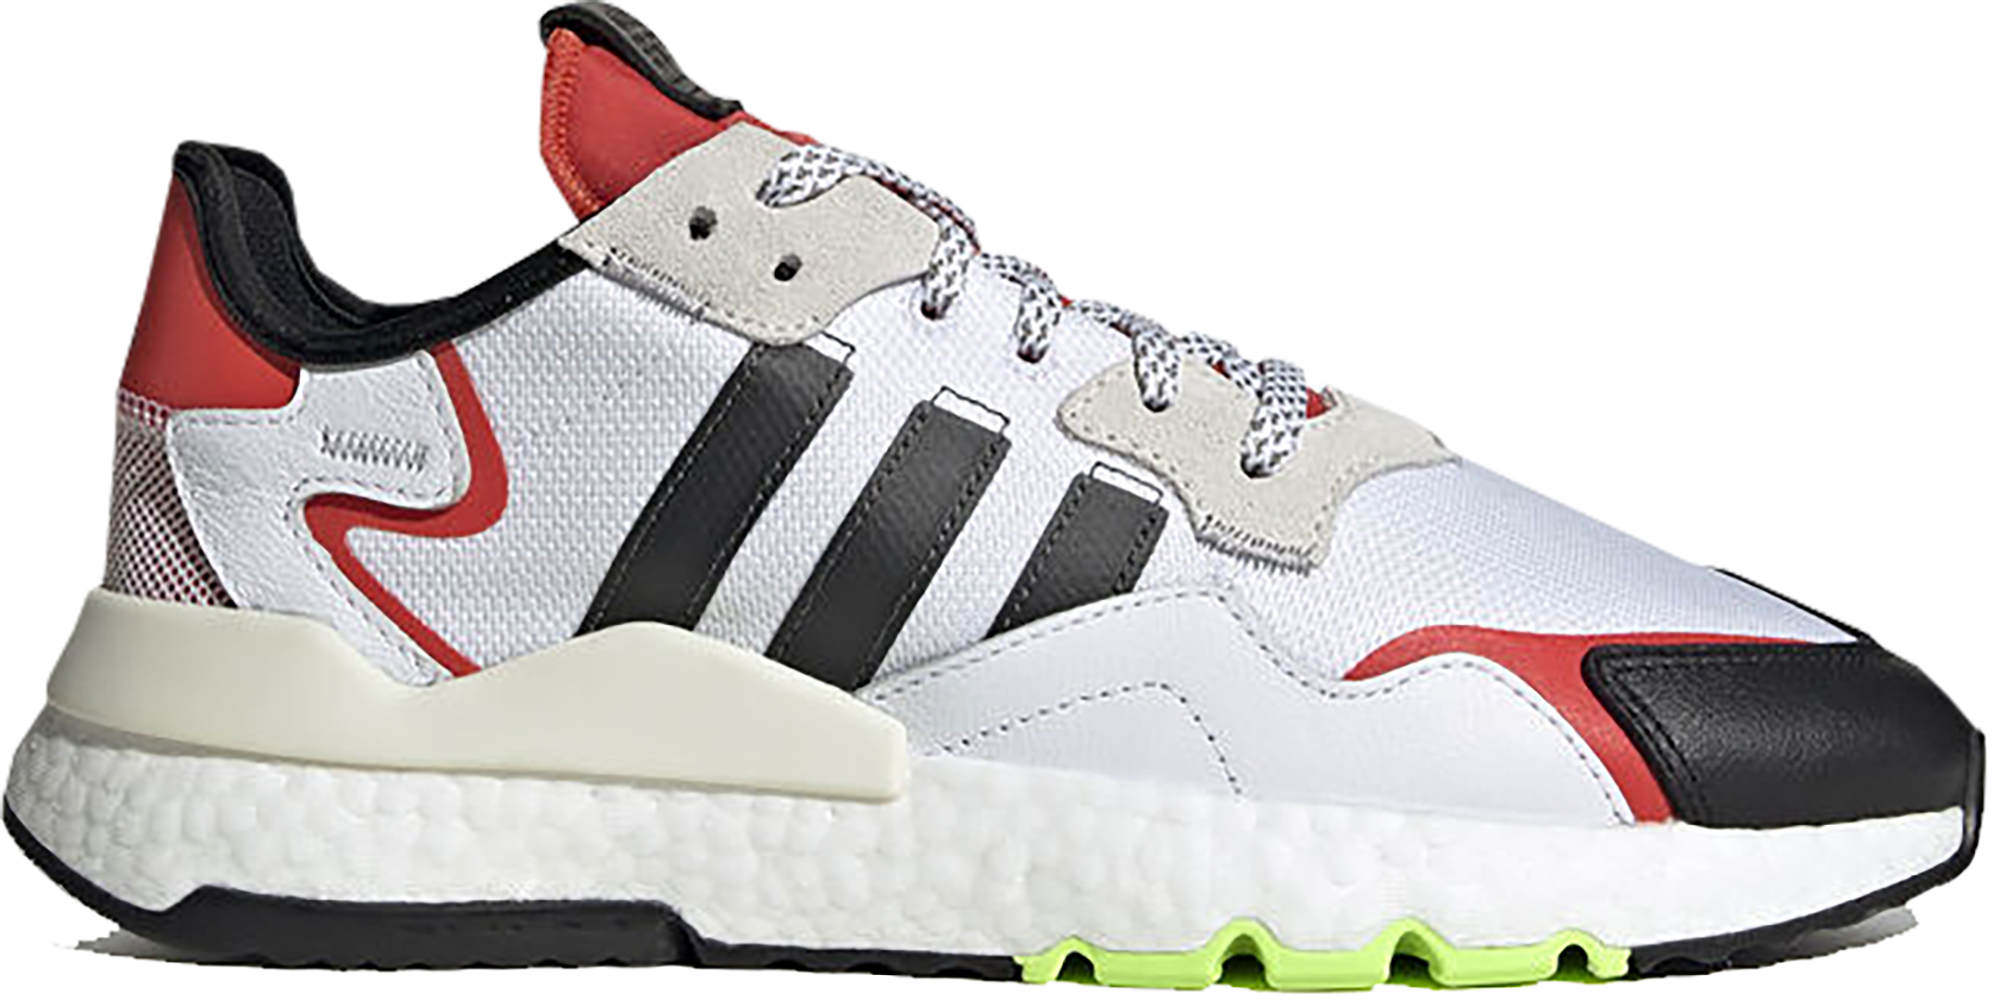 adidas Nite Jogger White Black Red - EH1293